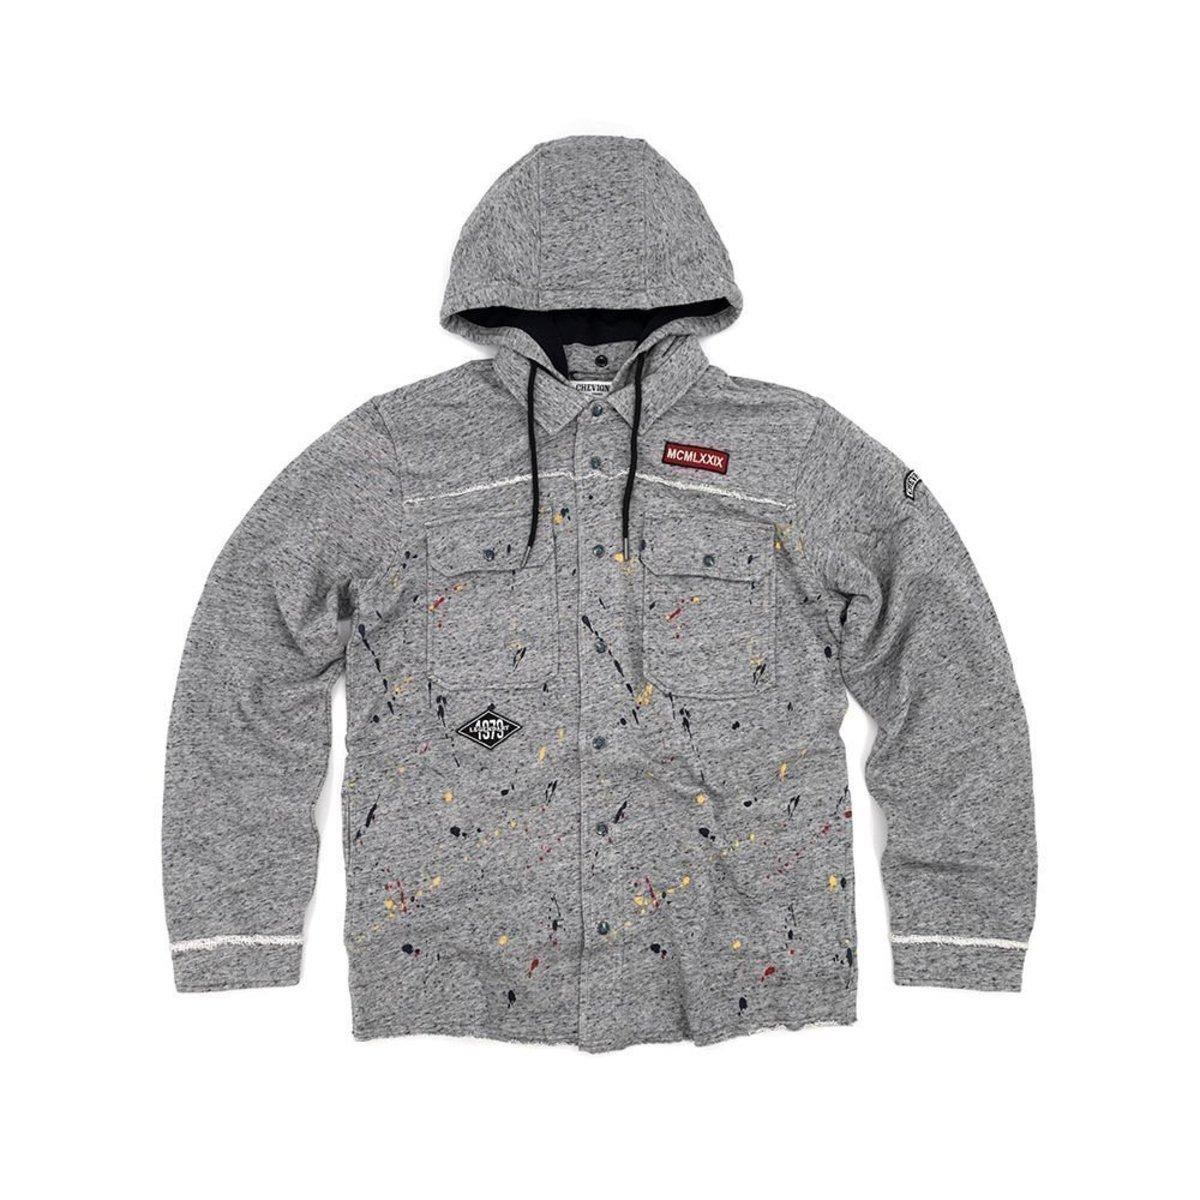 Men's Biker Knitted Detachable Hood Shirt Jacket